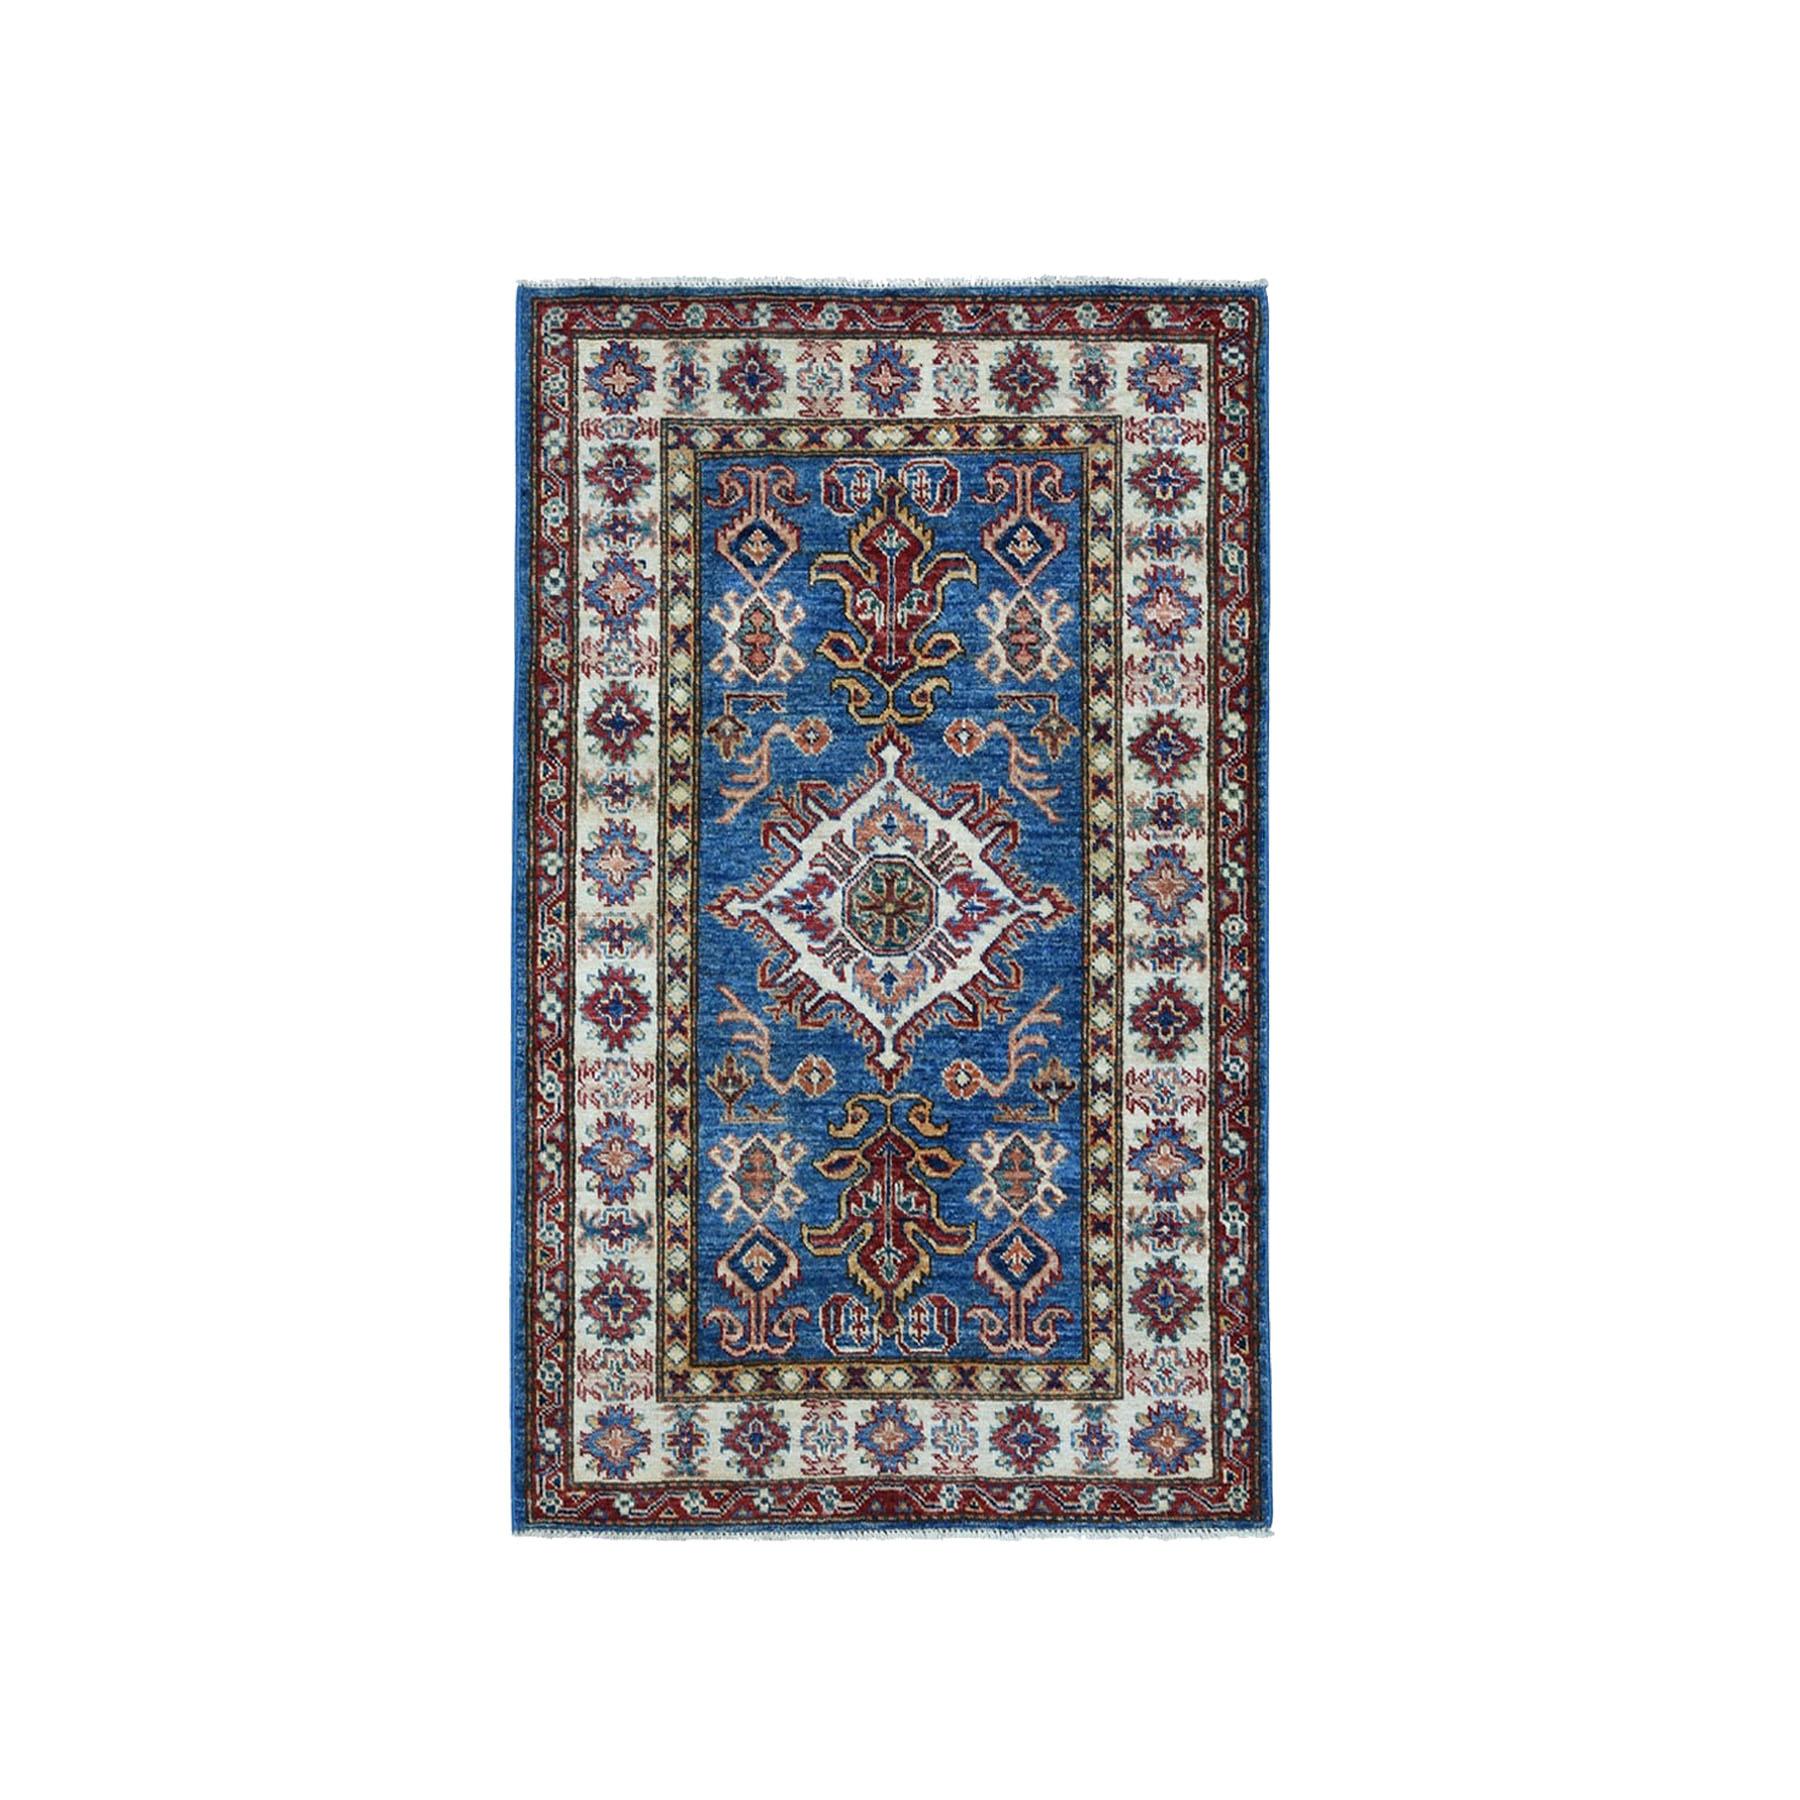 "2'10""X3'10"" Blue Super Kazak Pure Wool Geometric Design Hand-Knotted Oriental Rug moae0a00"